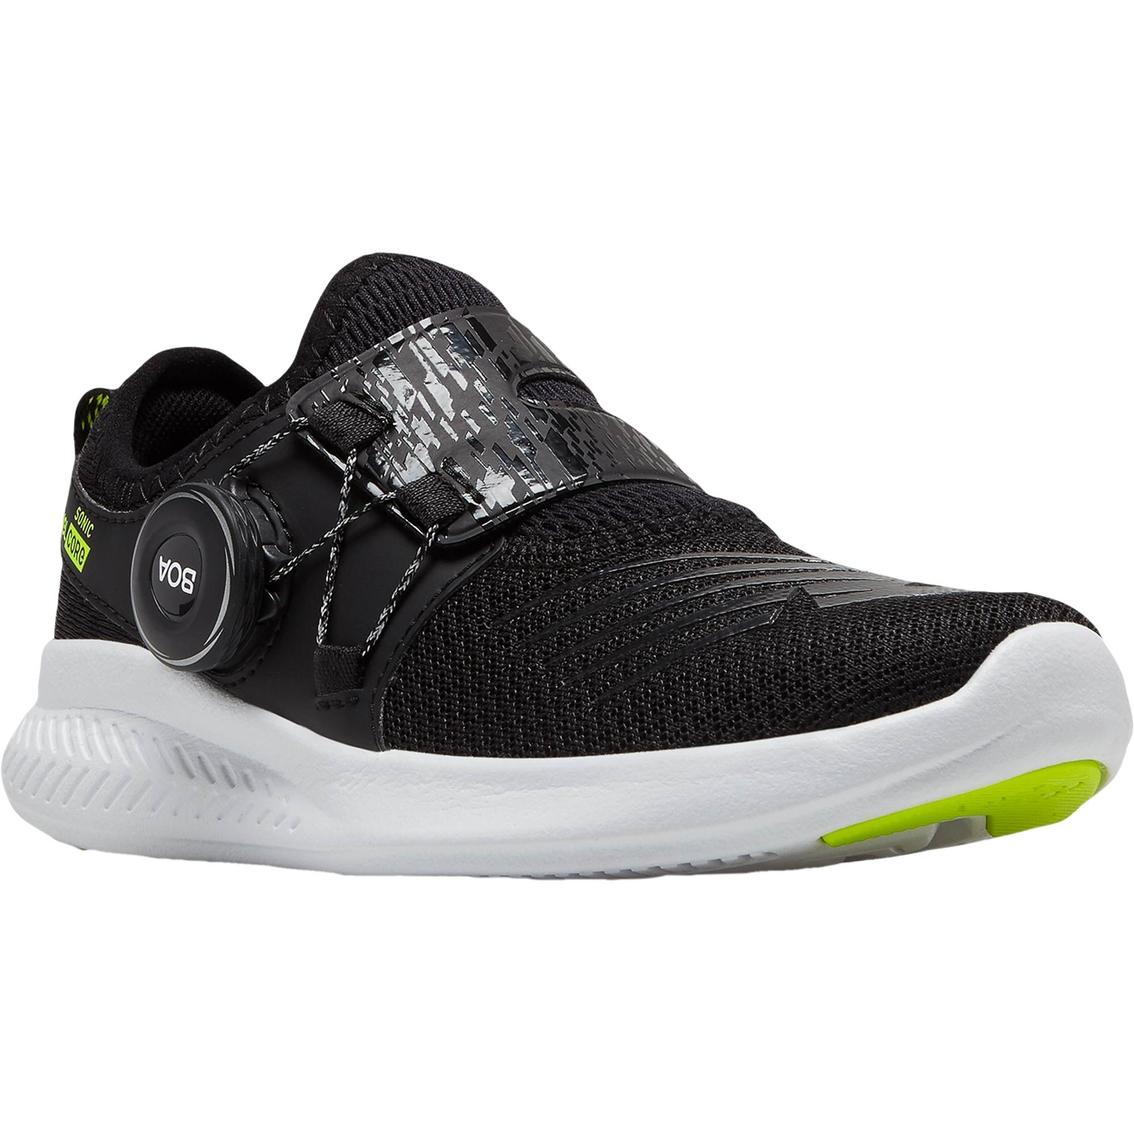 6e49299738f8c New Balance Boys Fuelcore Reveal Cushioned Running Shoes Kjbkobhg ...